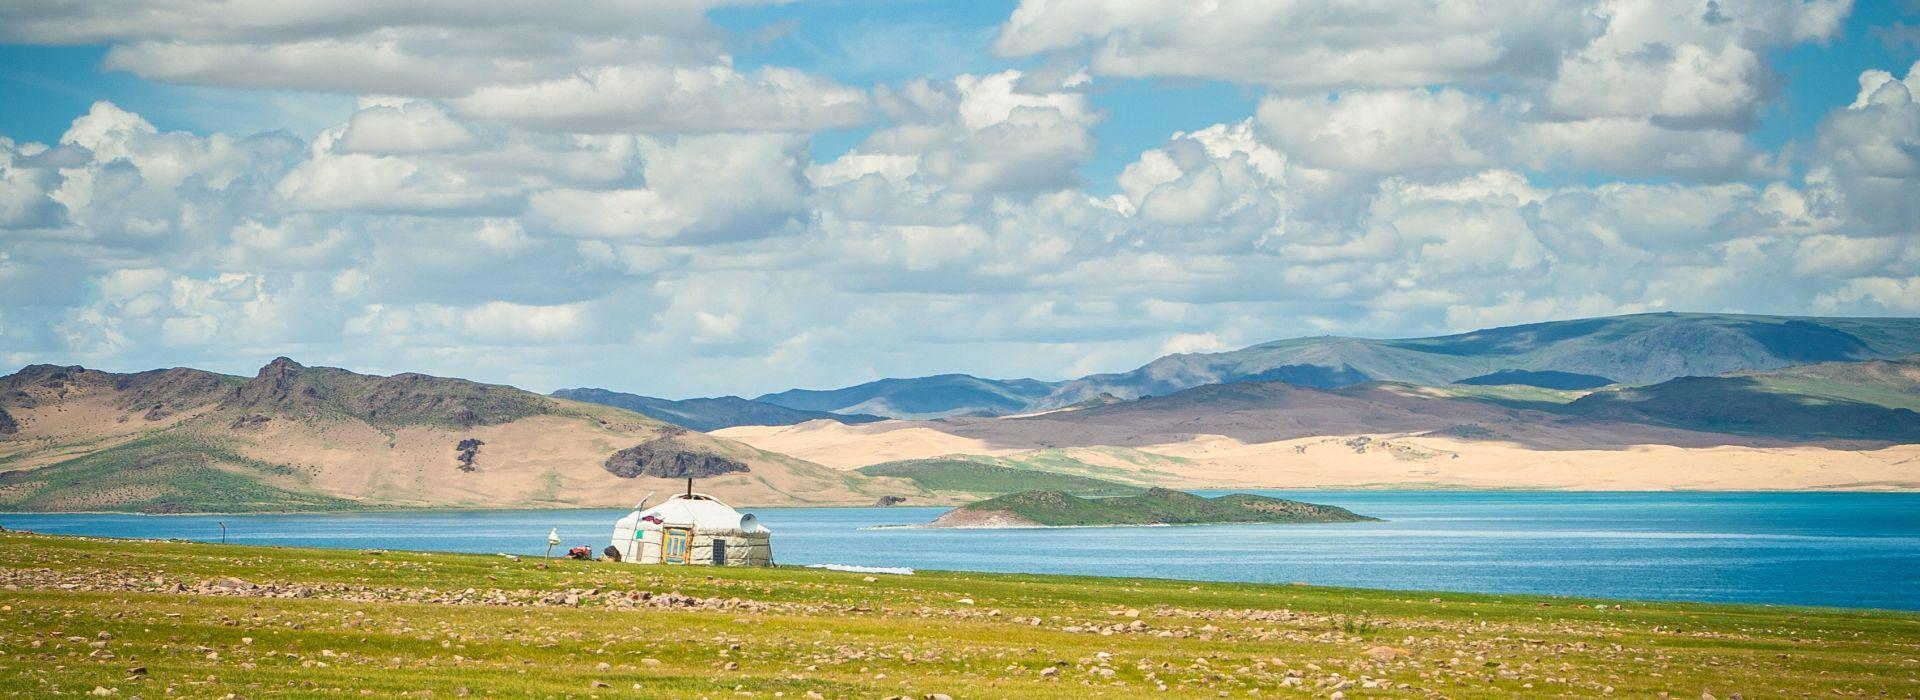 Adventure Tours in Mongolia